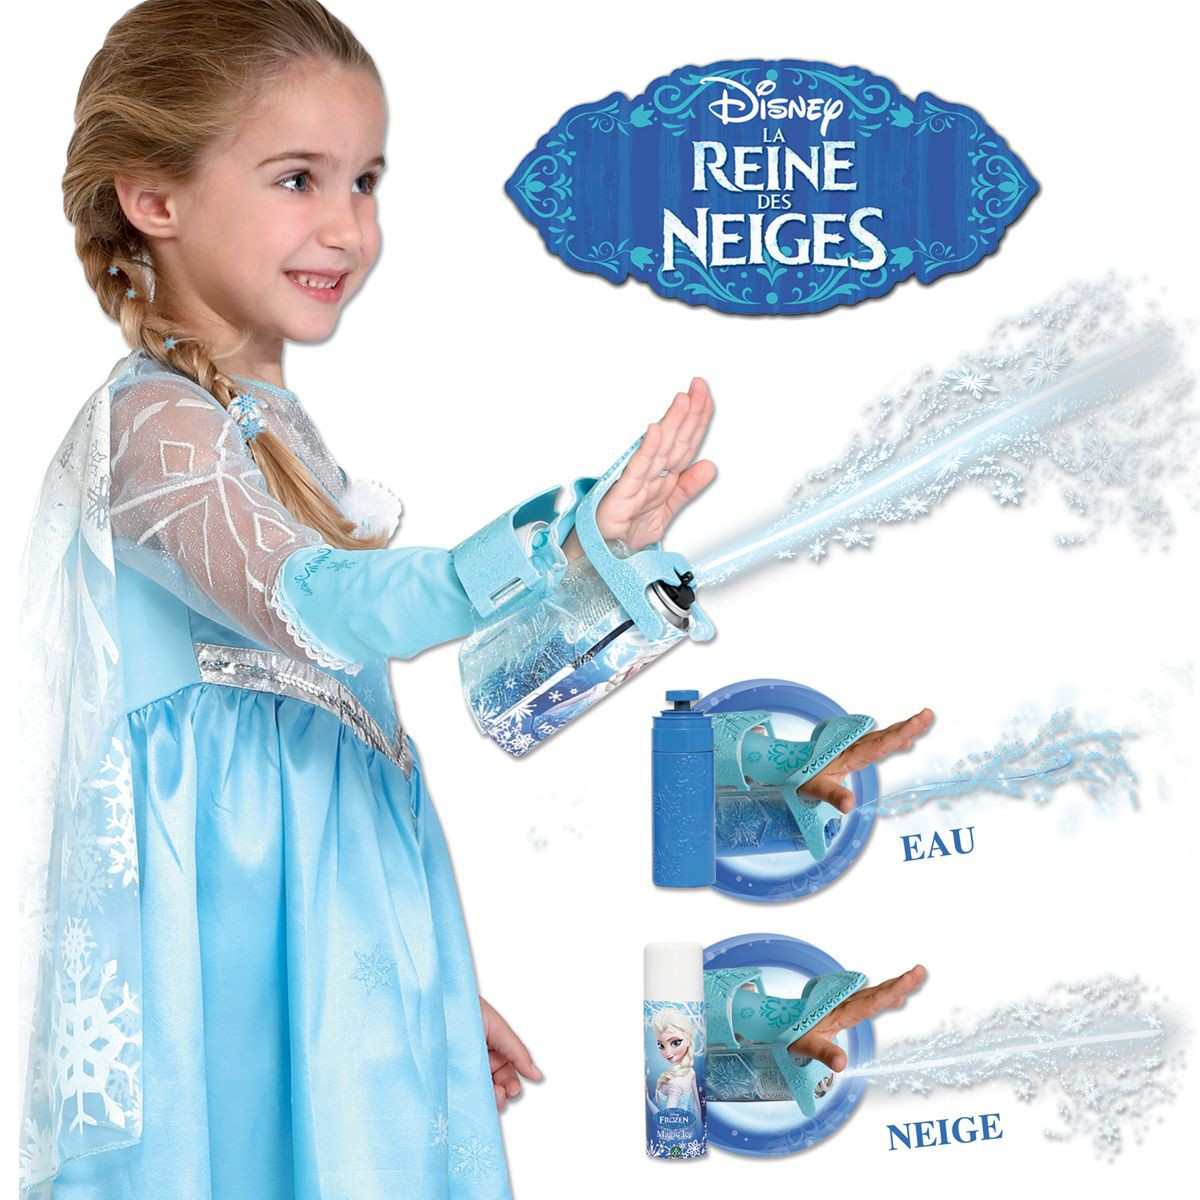 gant lance neige reine des neiges